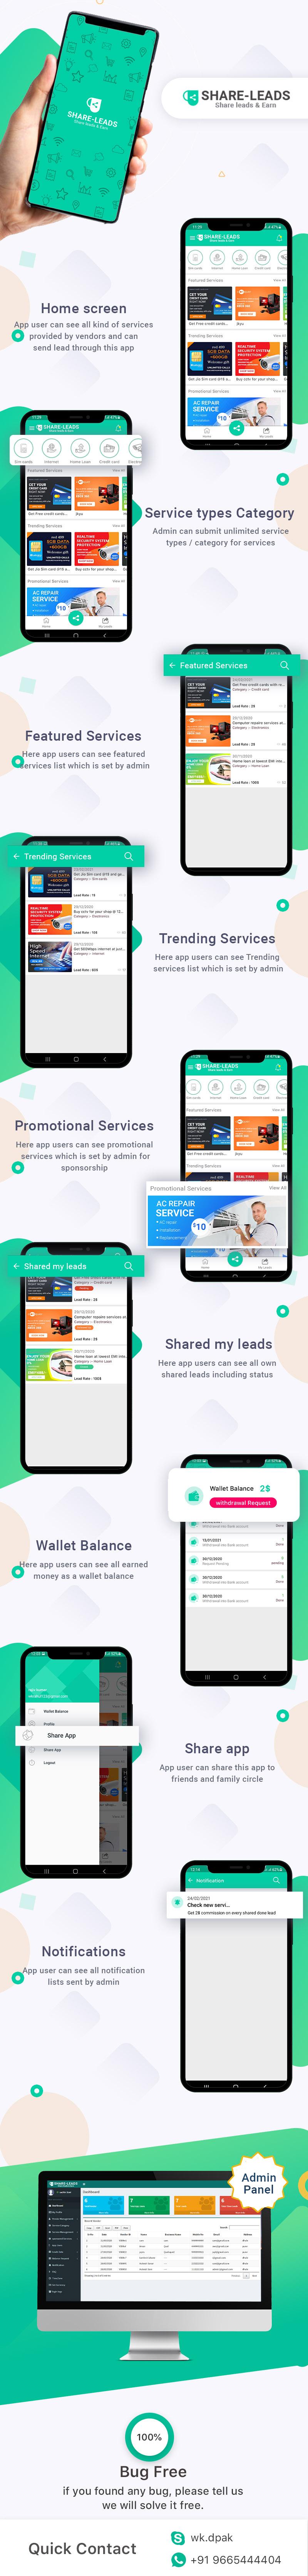 Share Leads & Earn - 2